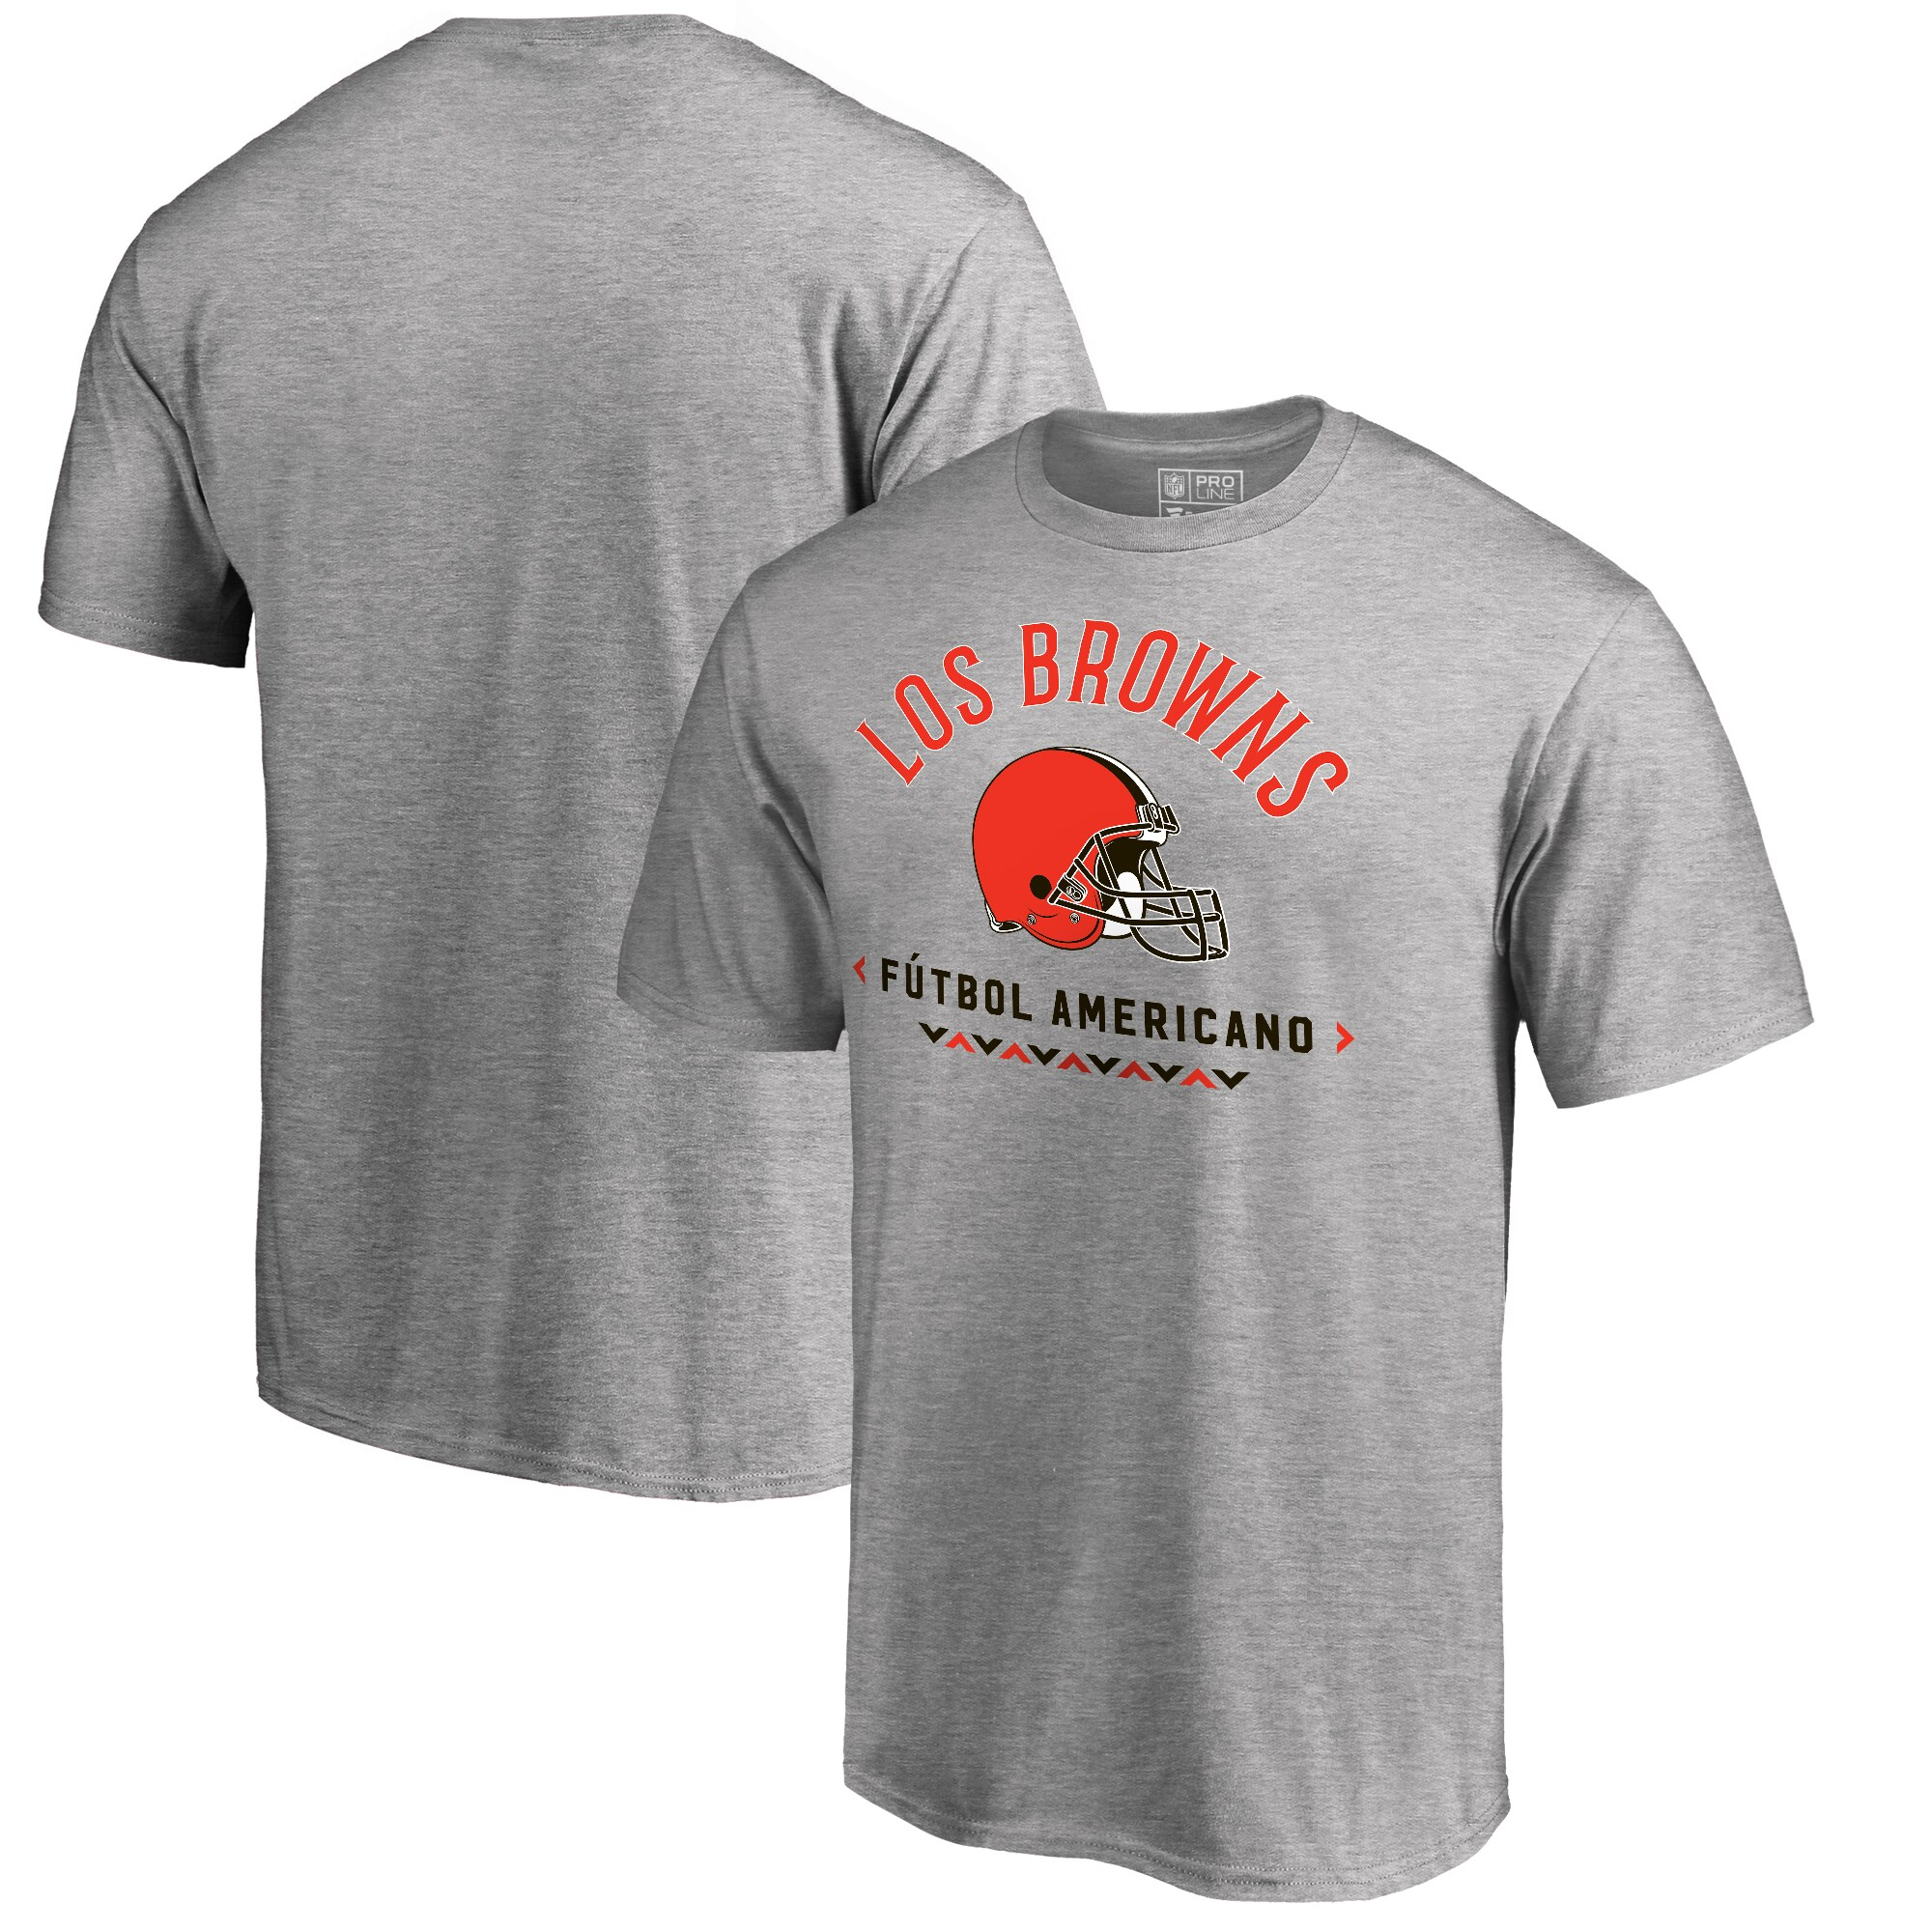 Cleveland Browns NFL Pro Line by Fanatics Branded Futbol Americano Big & Tall T-Shirt - Heathered Gray